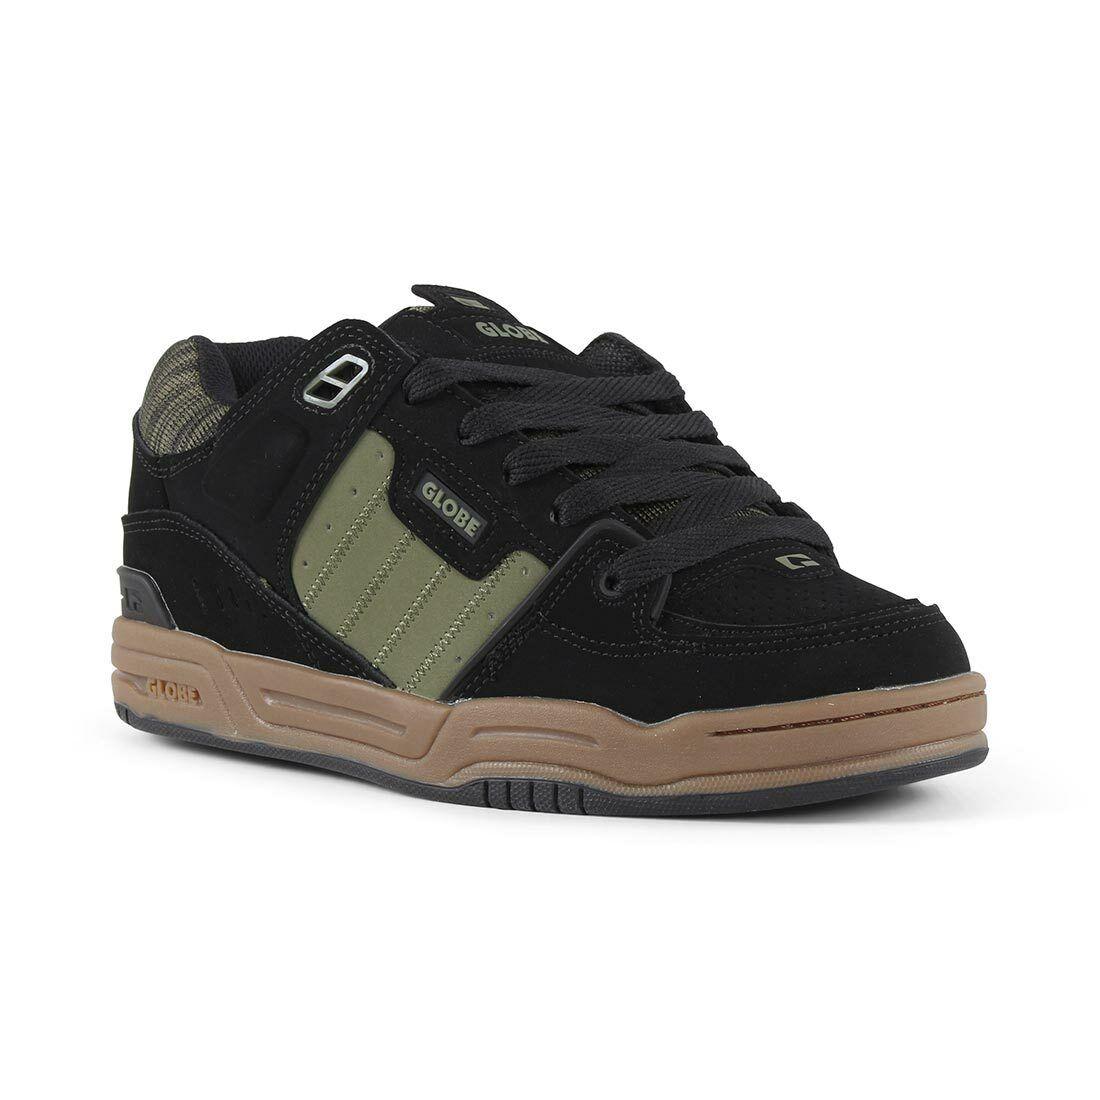 Globe Fusion shoes - Black   Olive   Knit